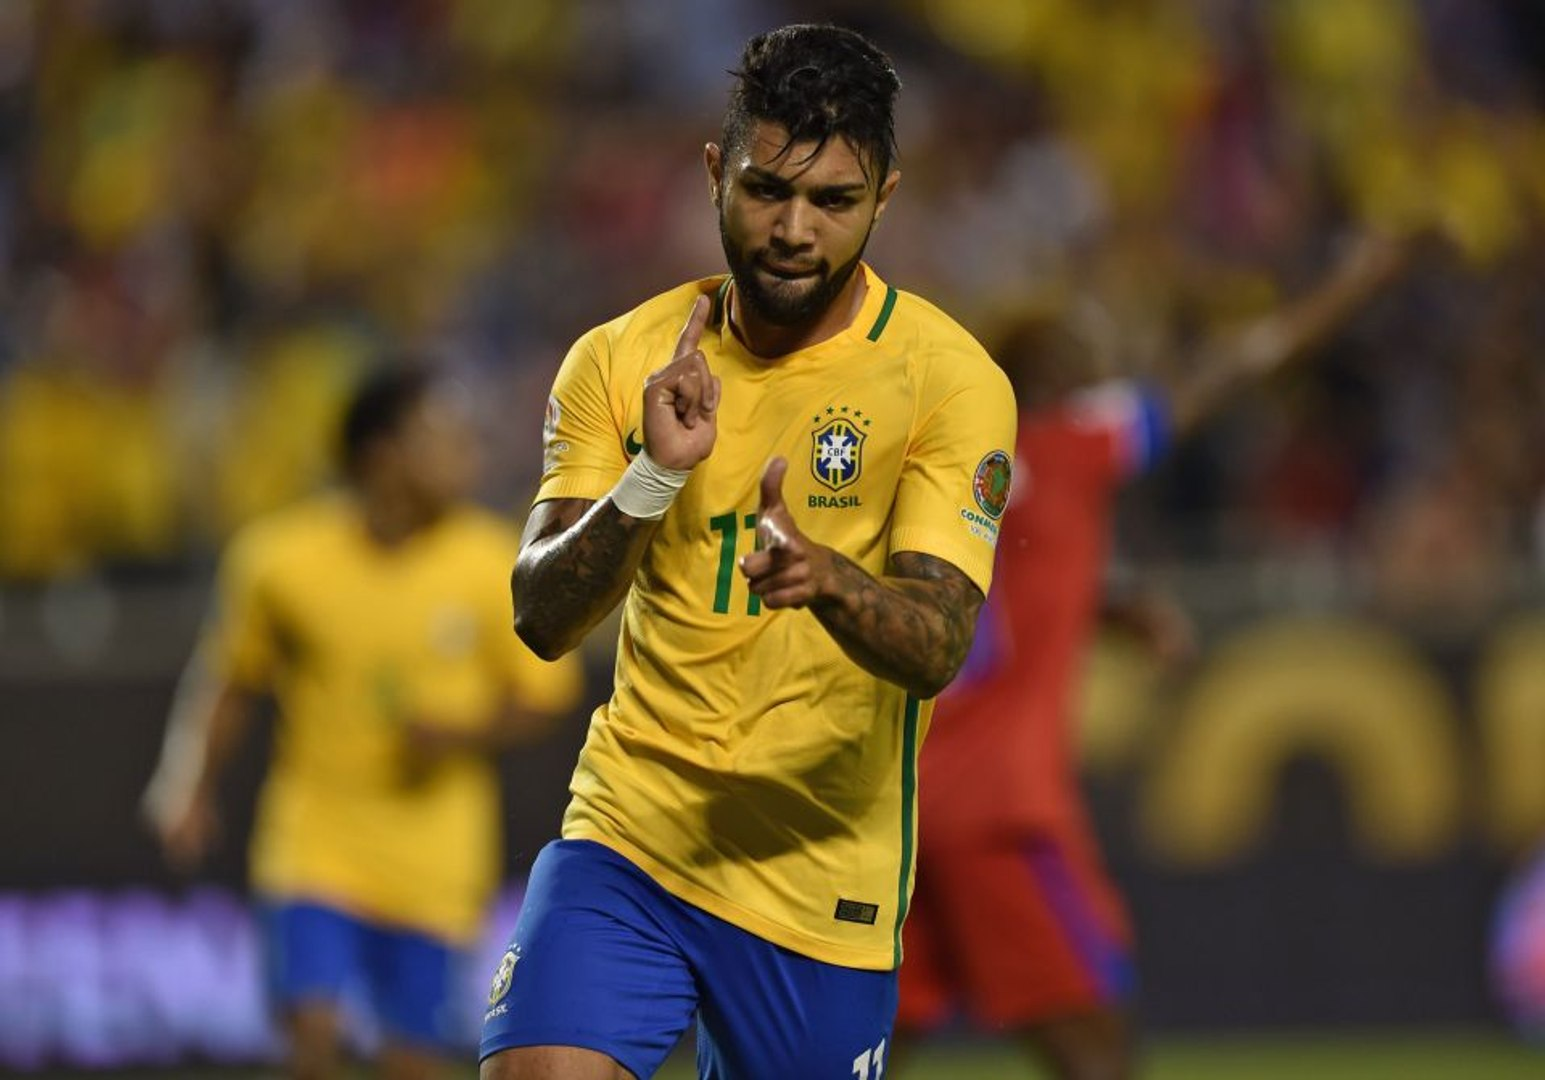 Gabriel Barbosa - All Goals & Skills - Brazil National Team - Olympics Rio 2016 - HD